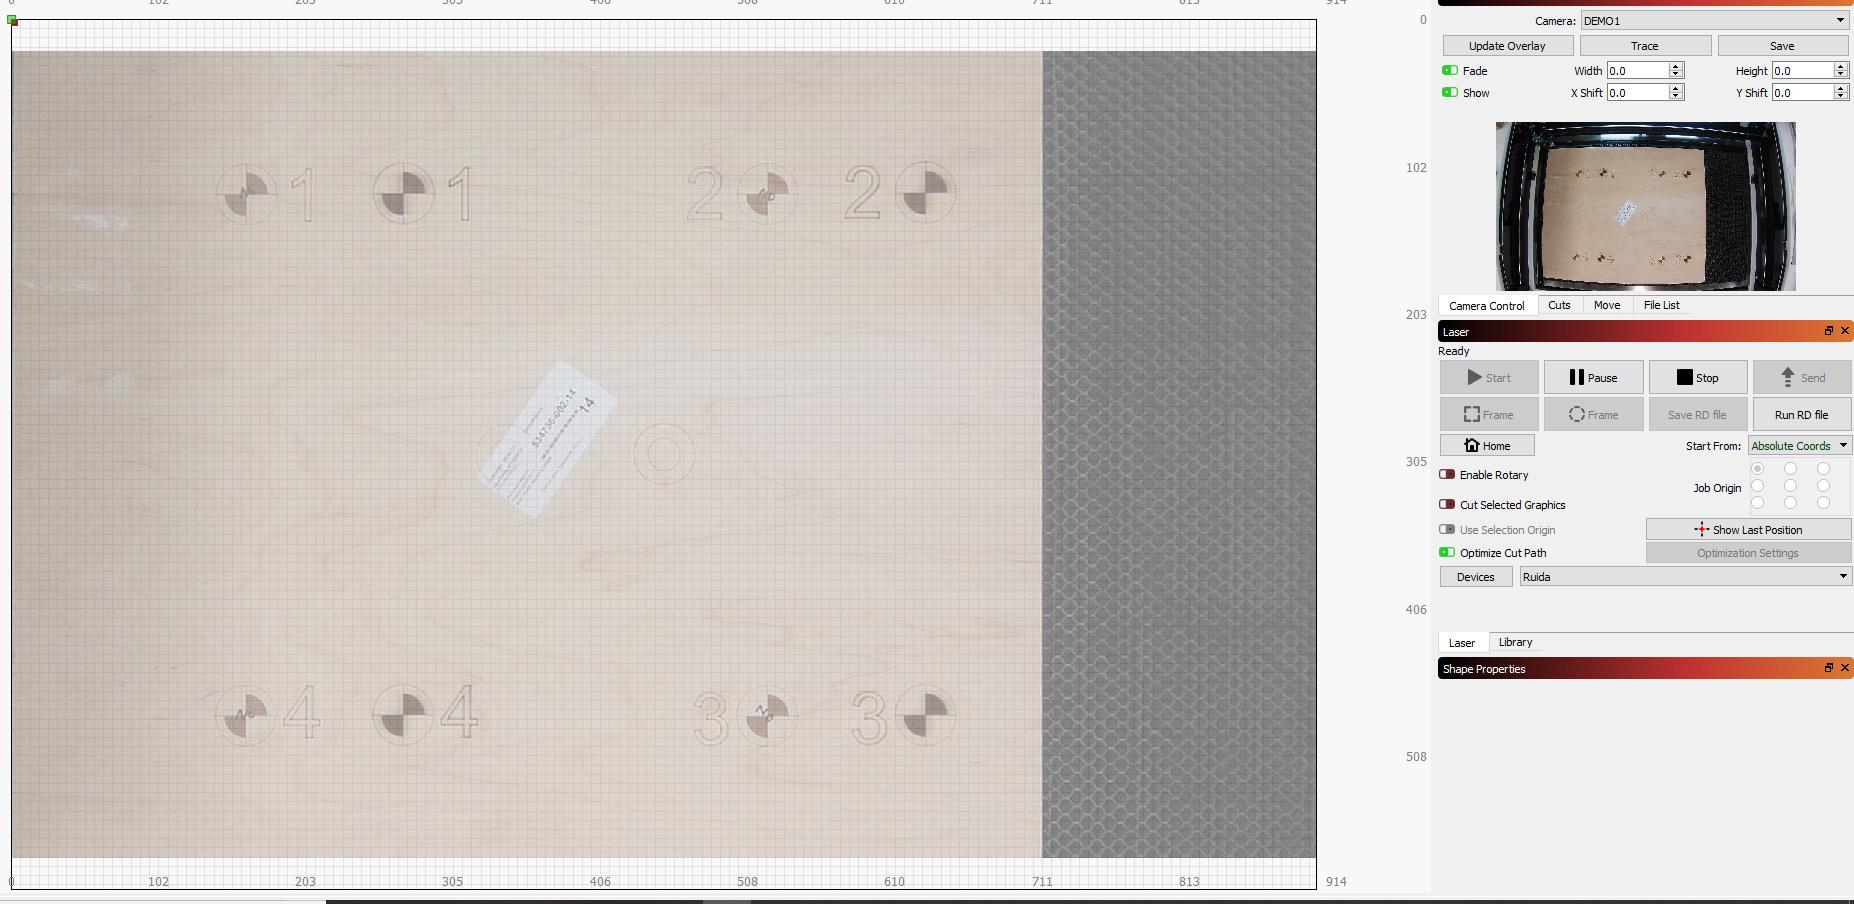 Camera calibration/alignment issues - Ruida controllers - LightBurn